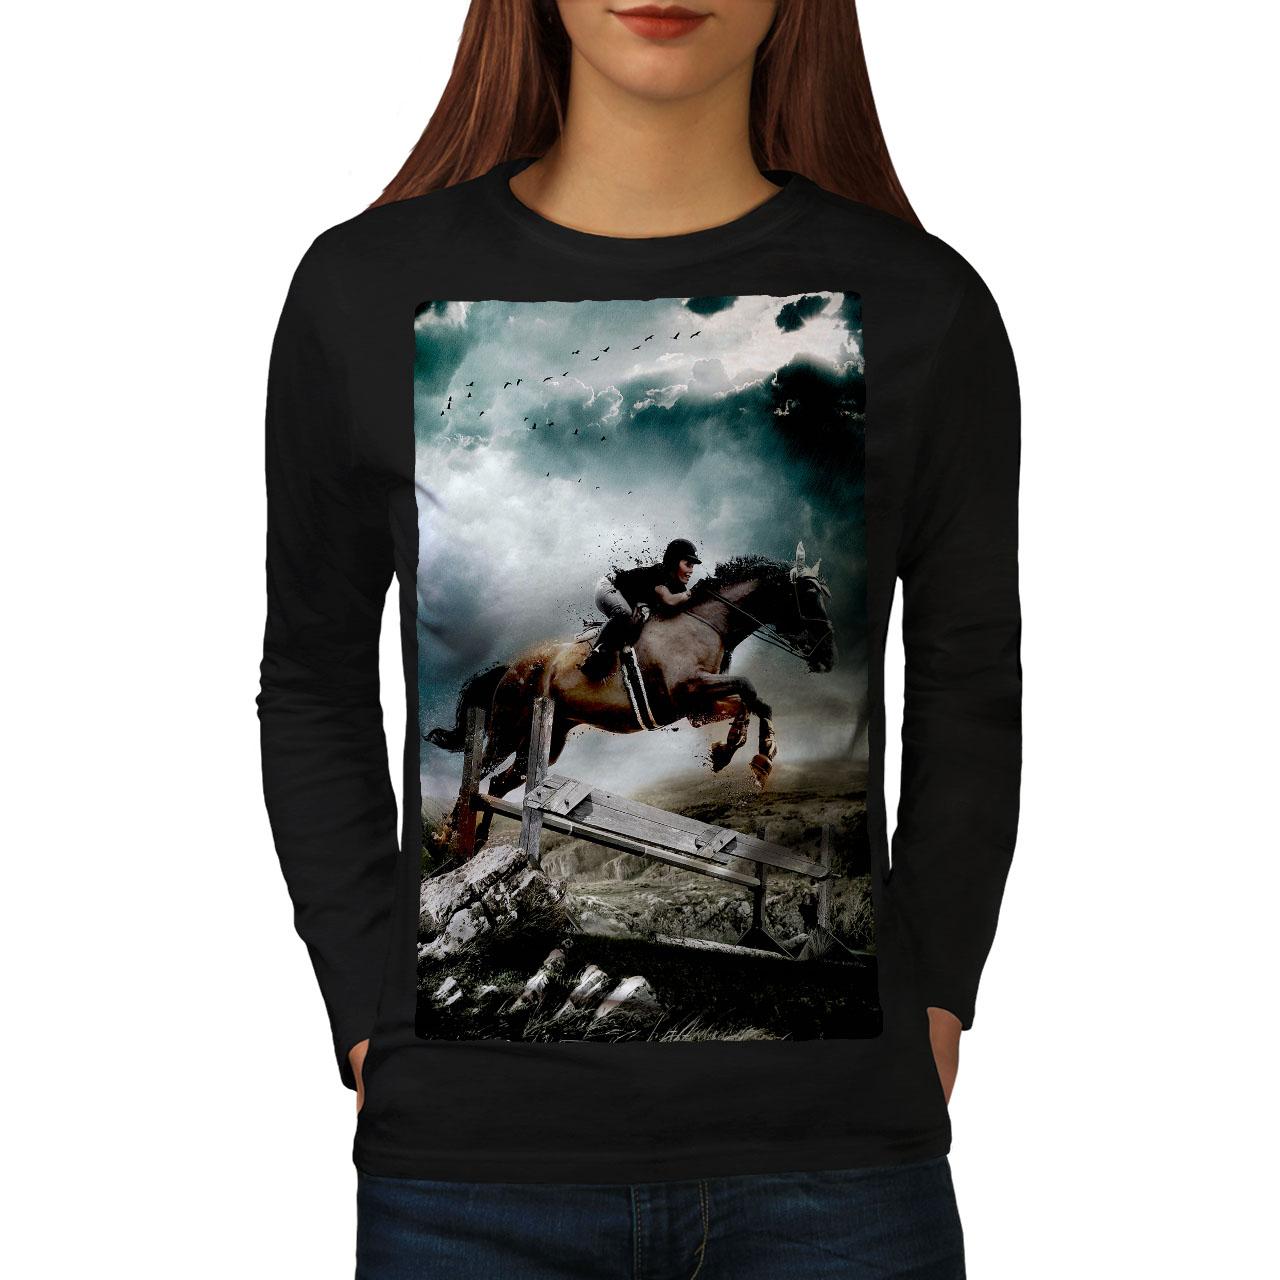 Animal Casual Design Printed Tee Wellcoda Horse Cool Animal Womens T-shirt